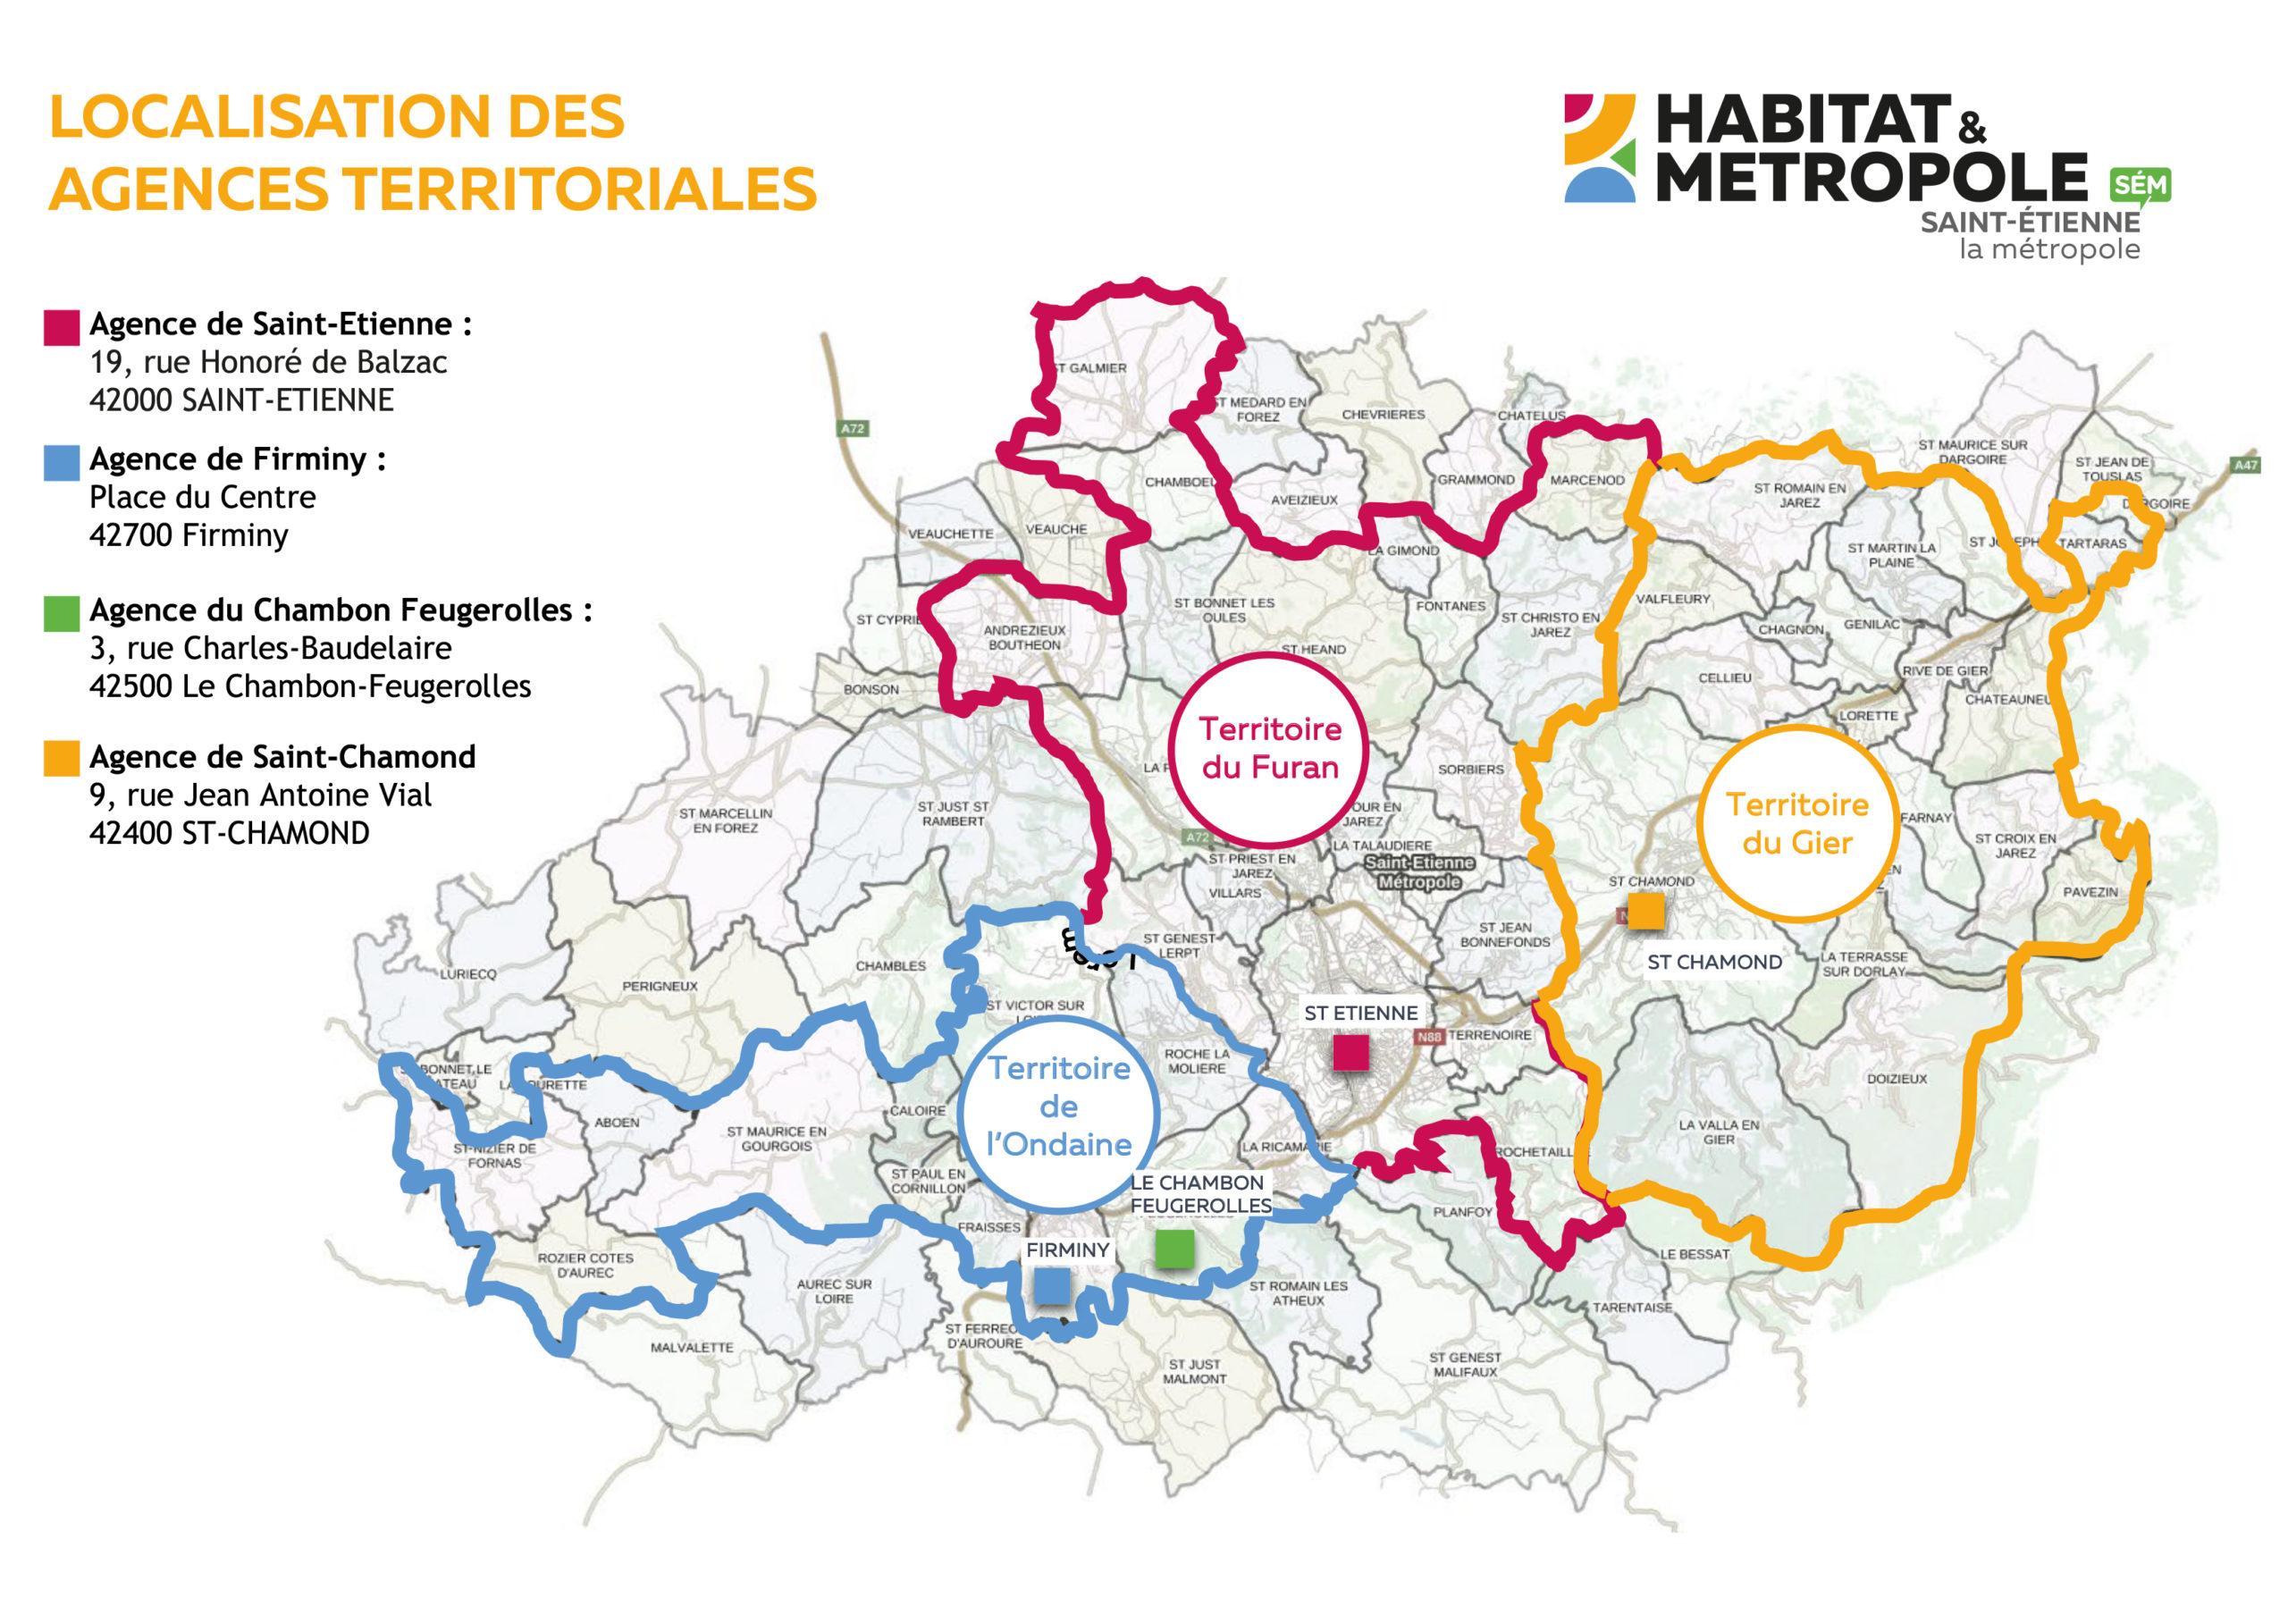 Localisation de nos agences territoriales